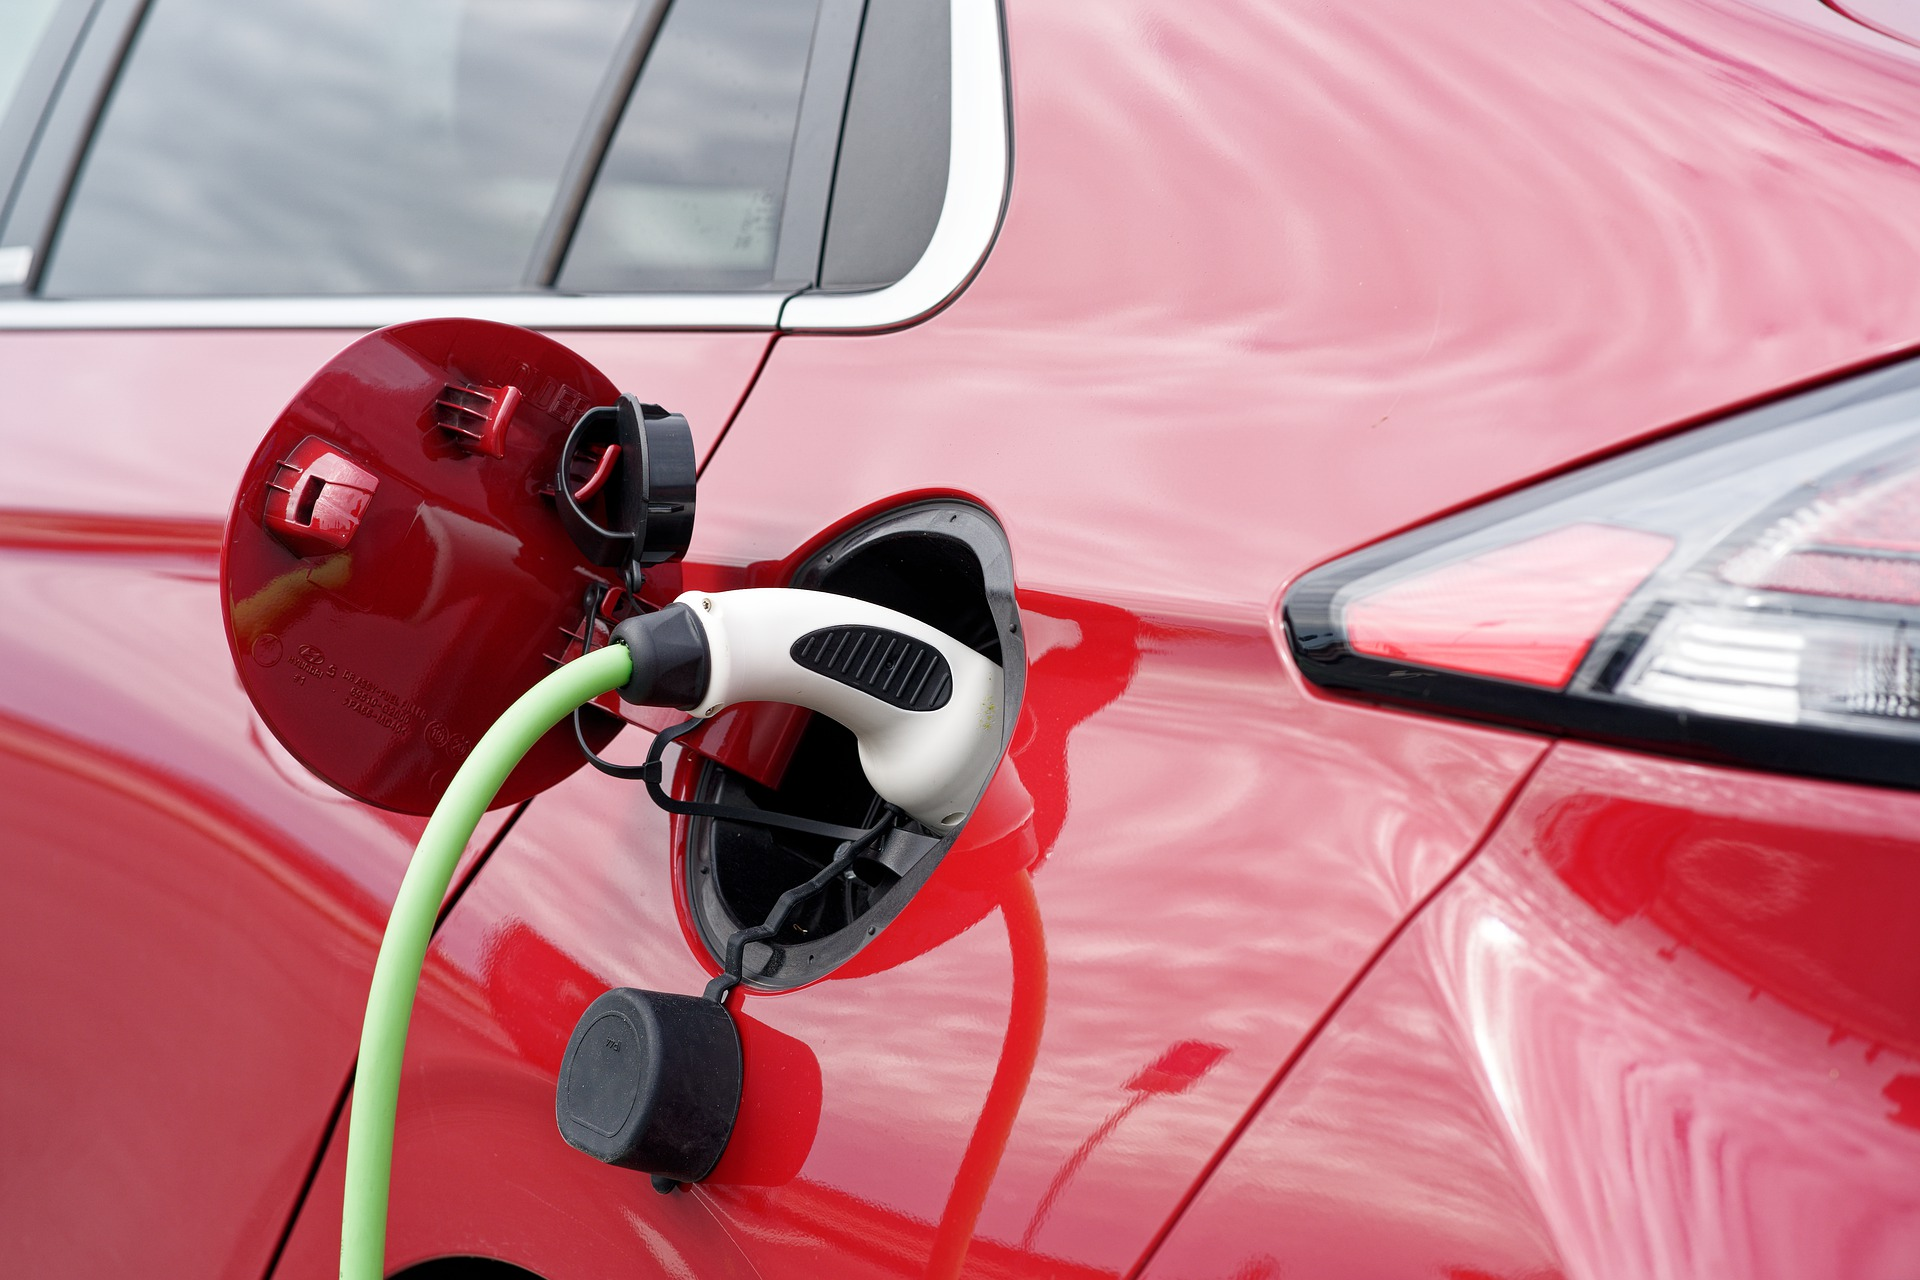 Electric vehicle charging - UK News